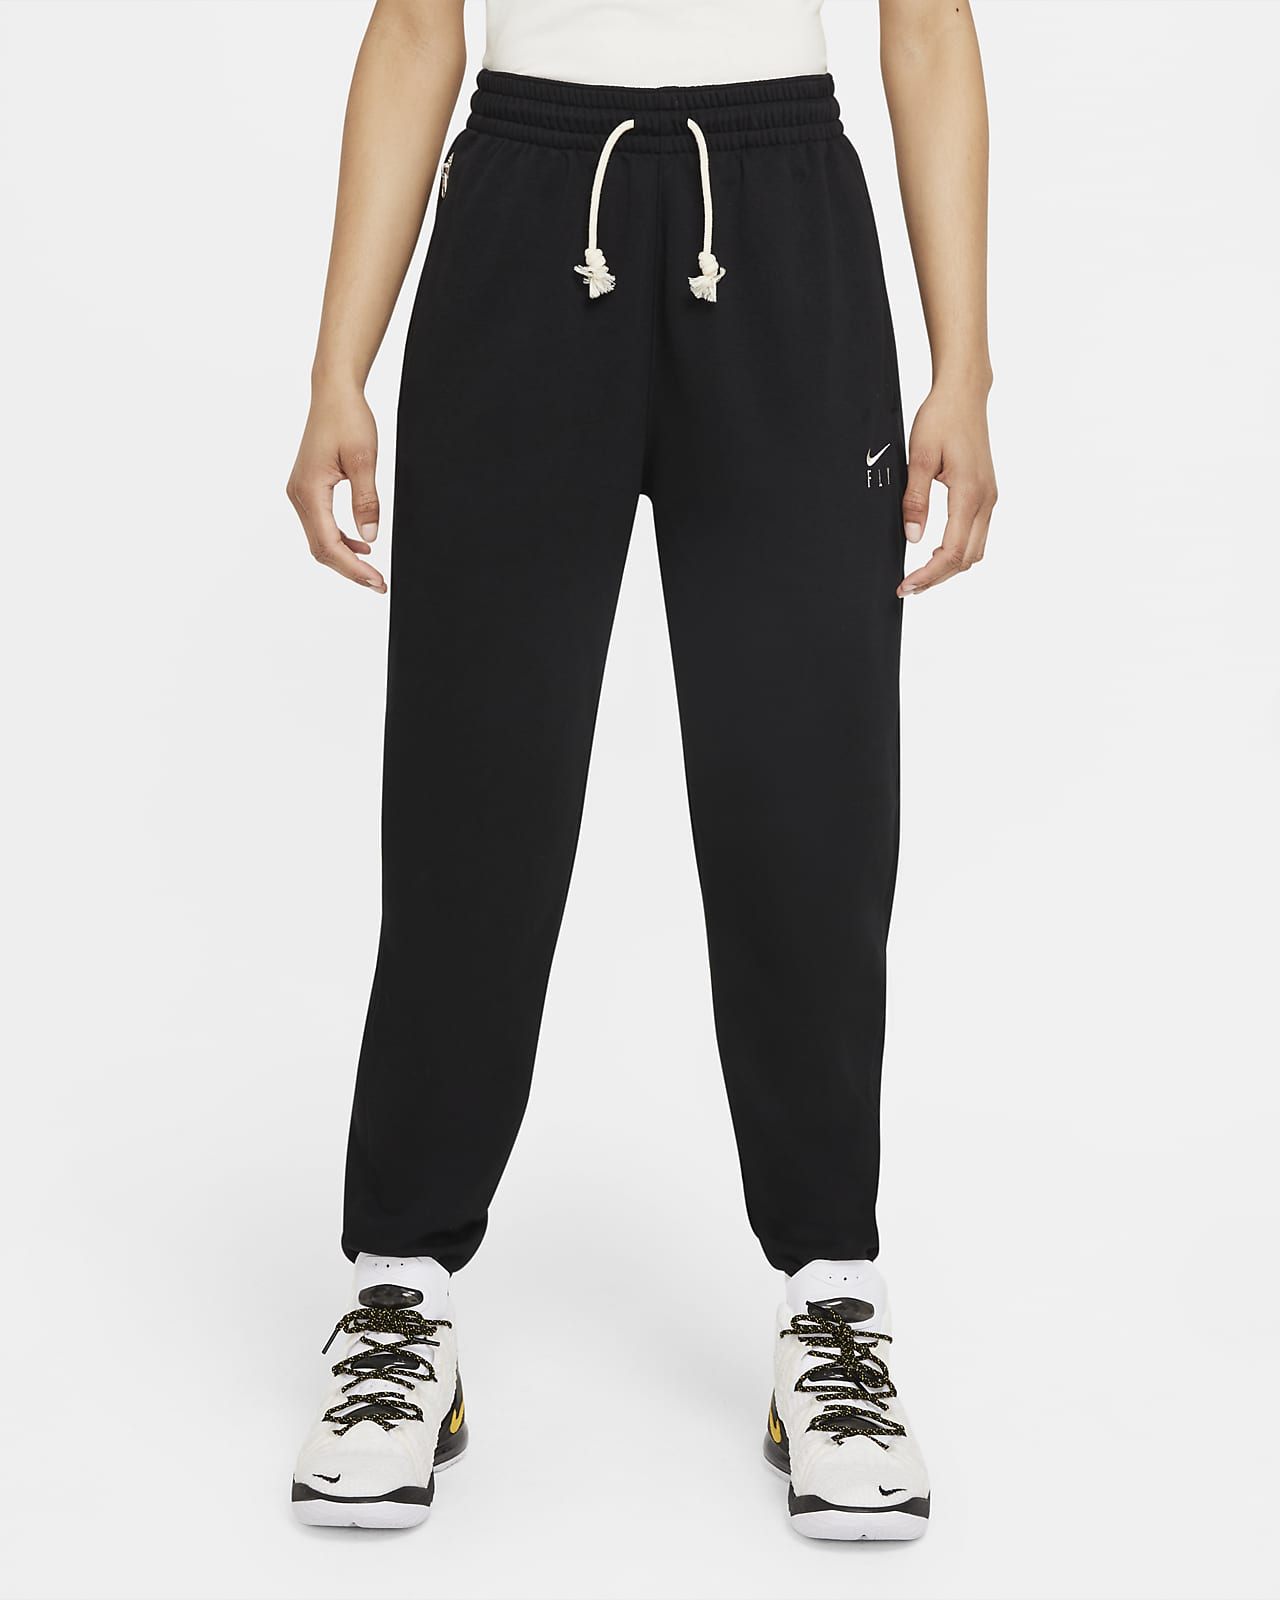 Pantalon de basketball Nike Dri-FIT Swoosh Fly Standard Issue pour Femme